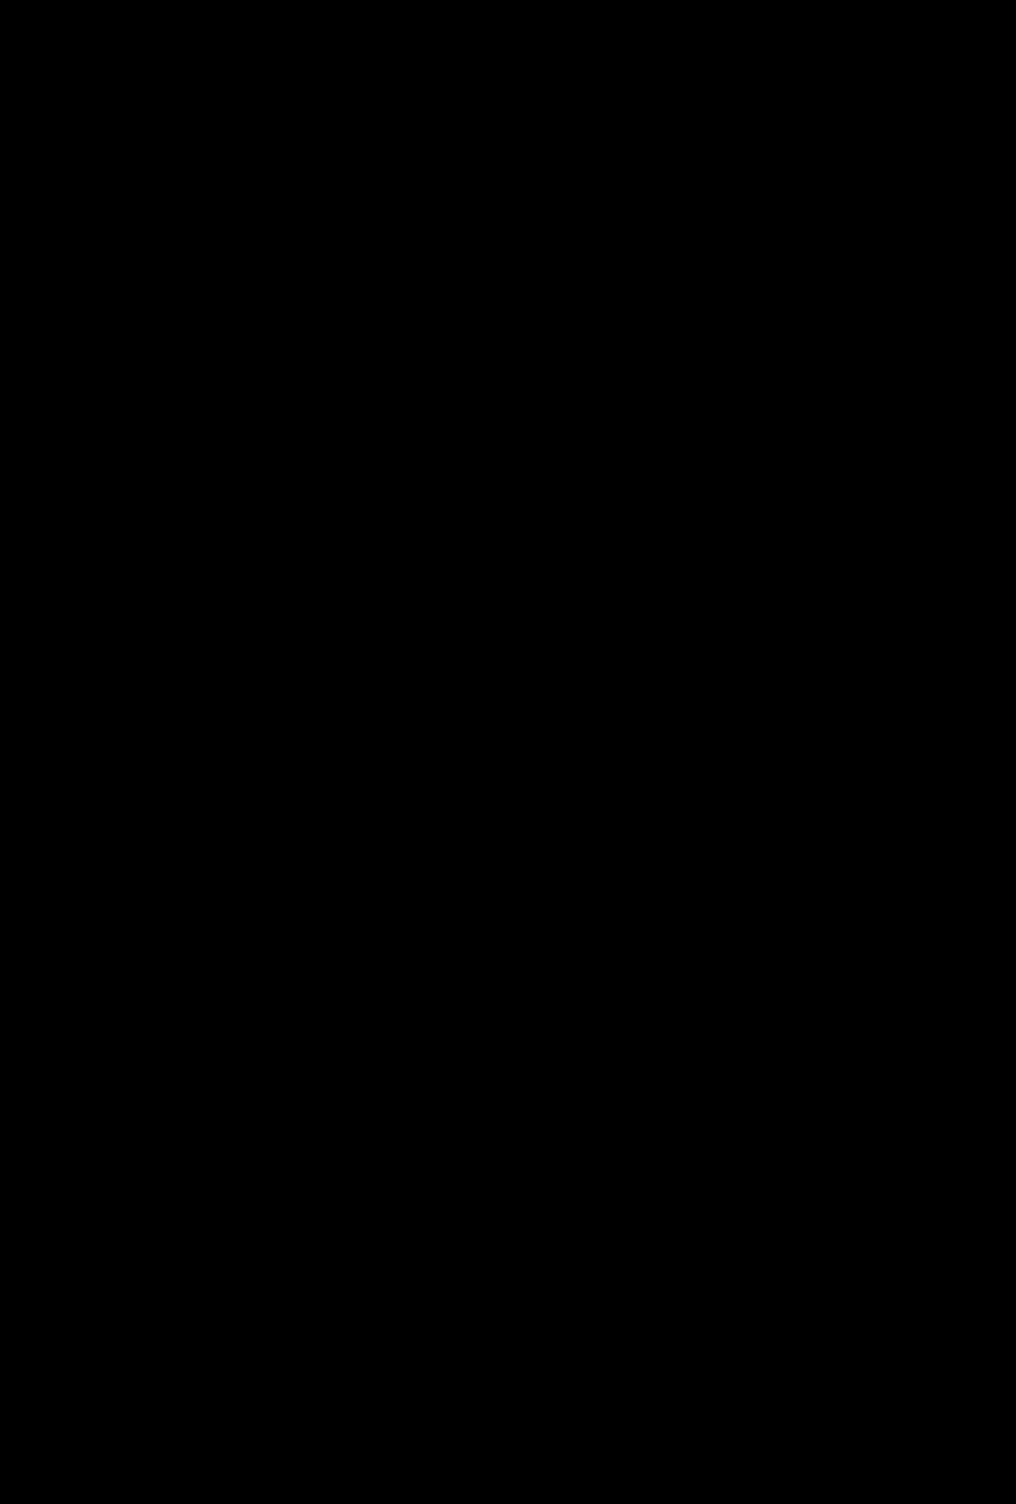 cbf-black-vert